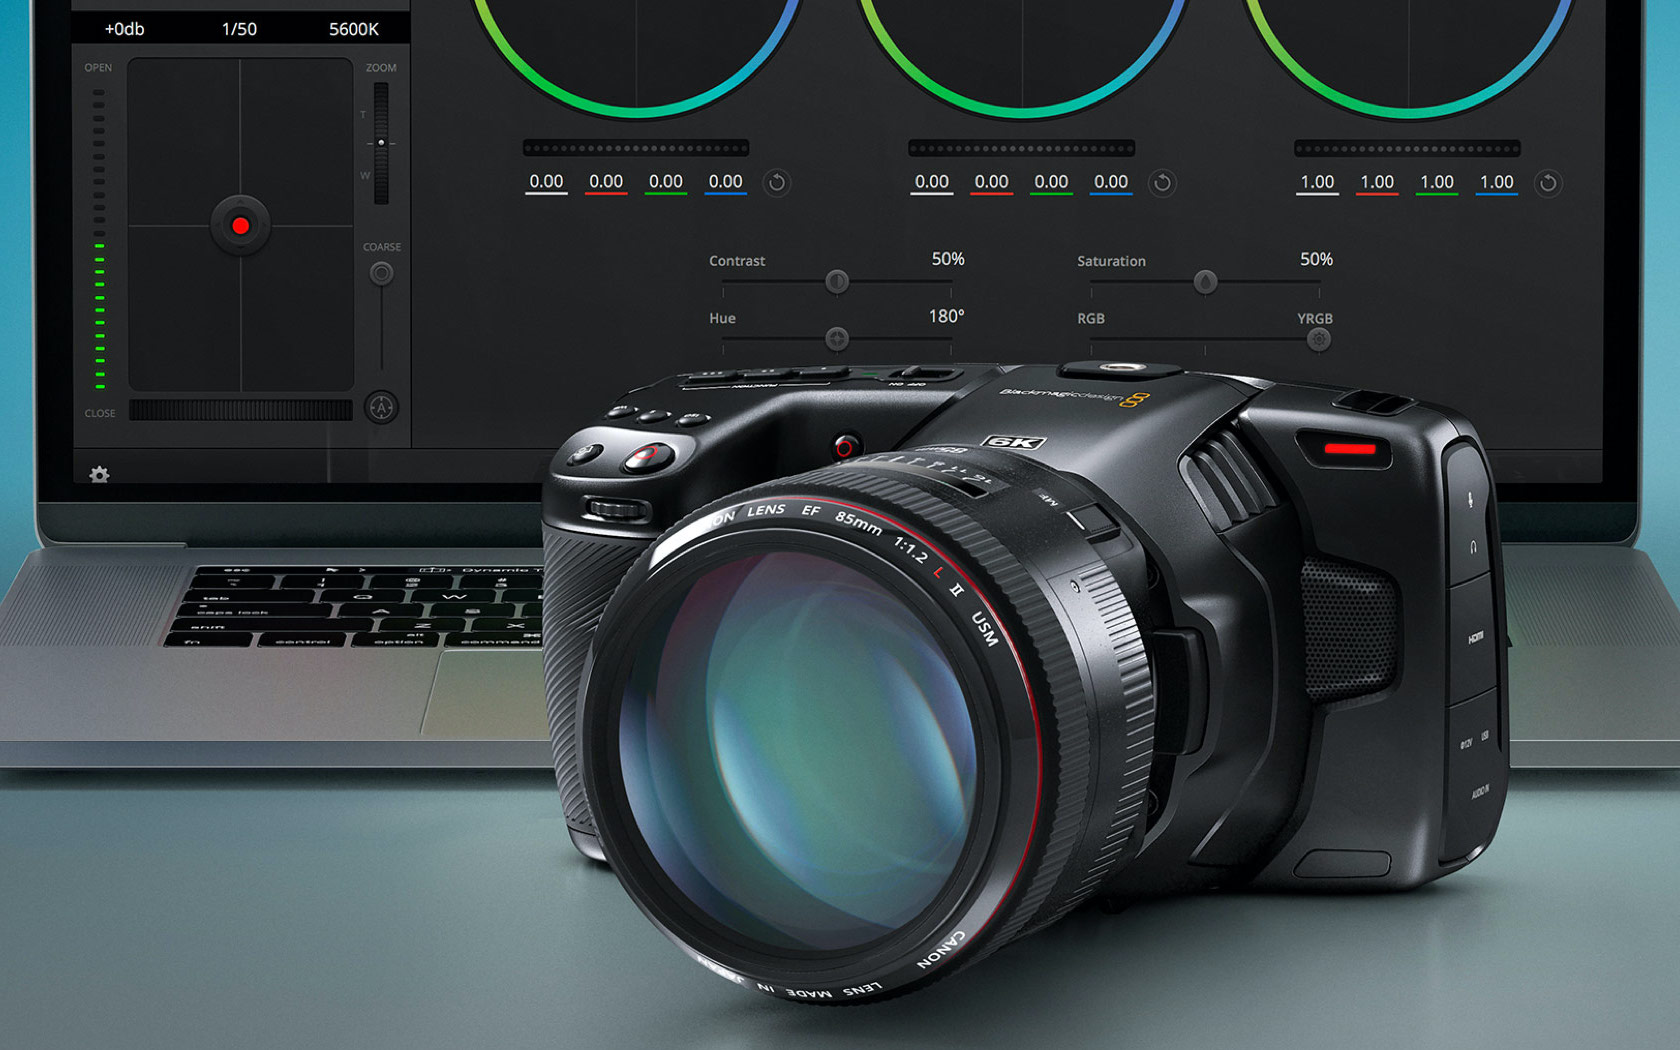 The Blackmagic Pocket Cinema Camera 6k Just Got A Lot More Affordable Slashgear